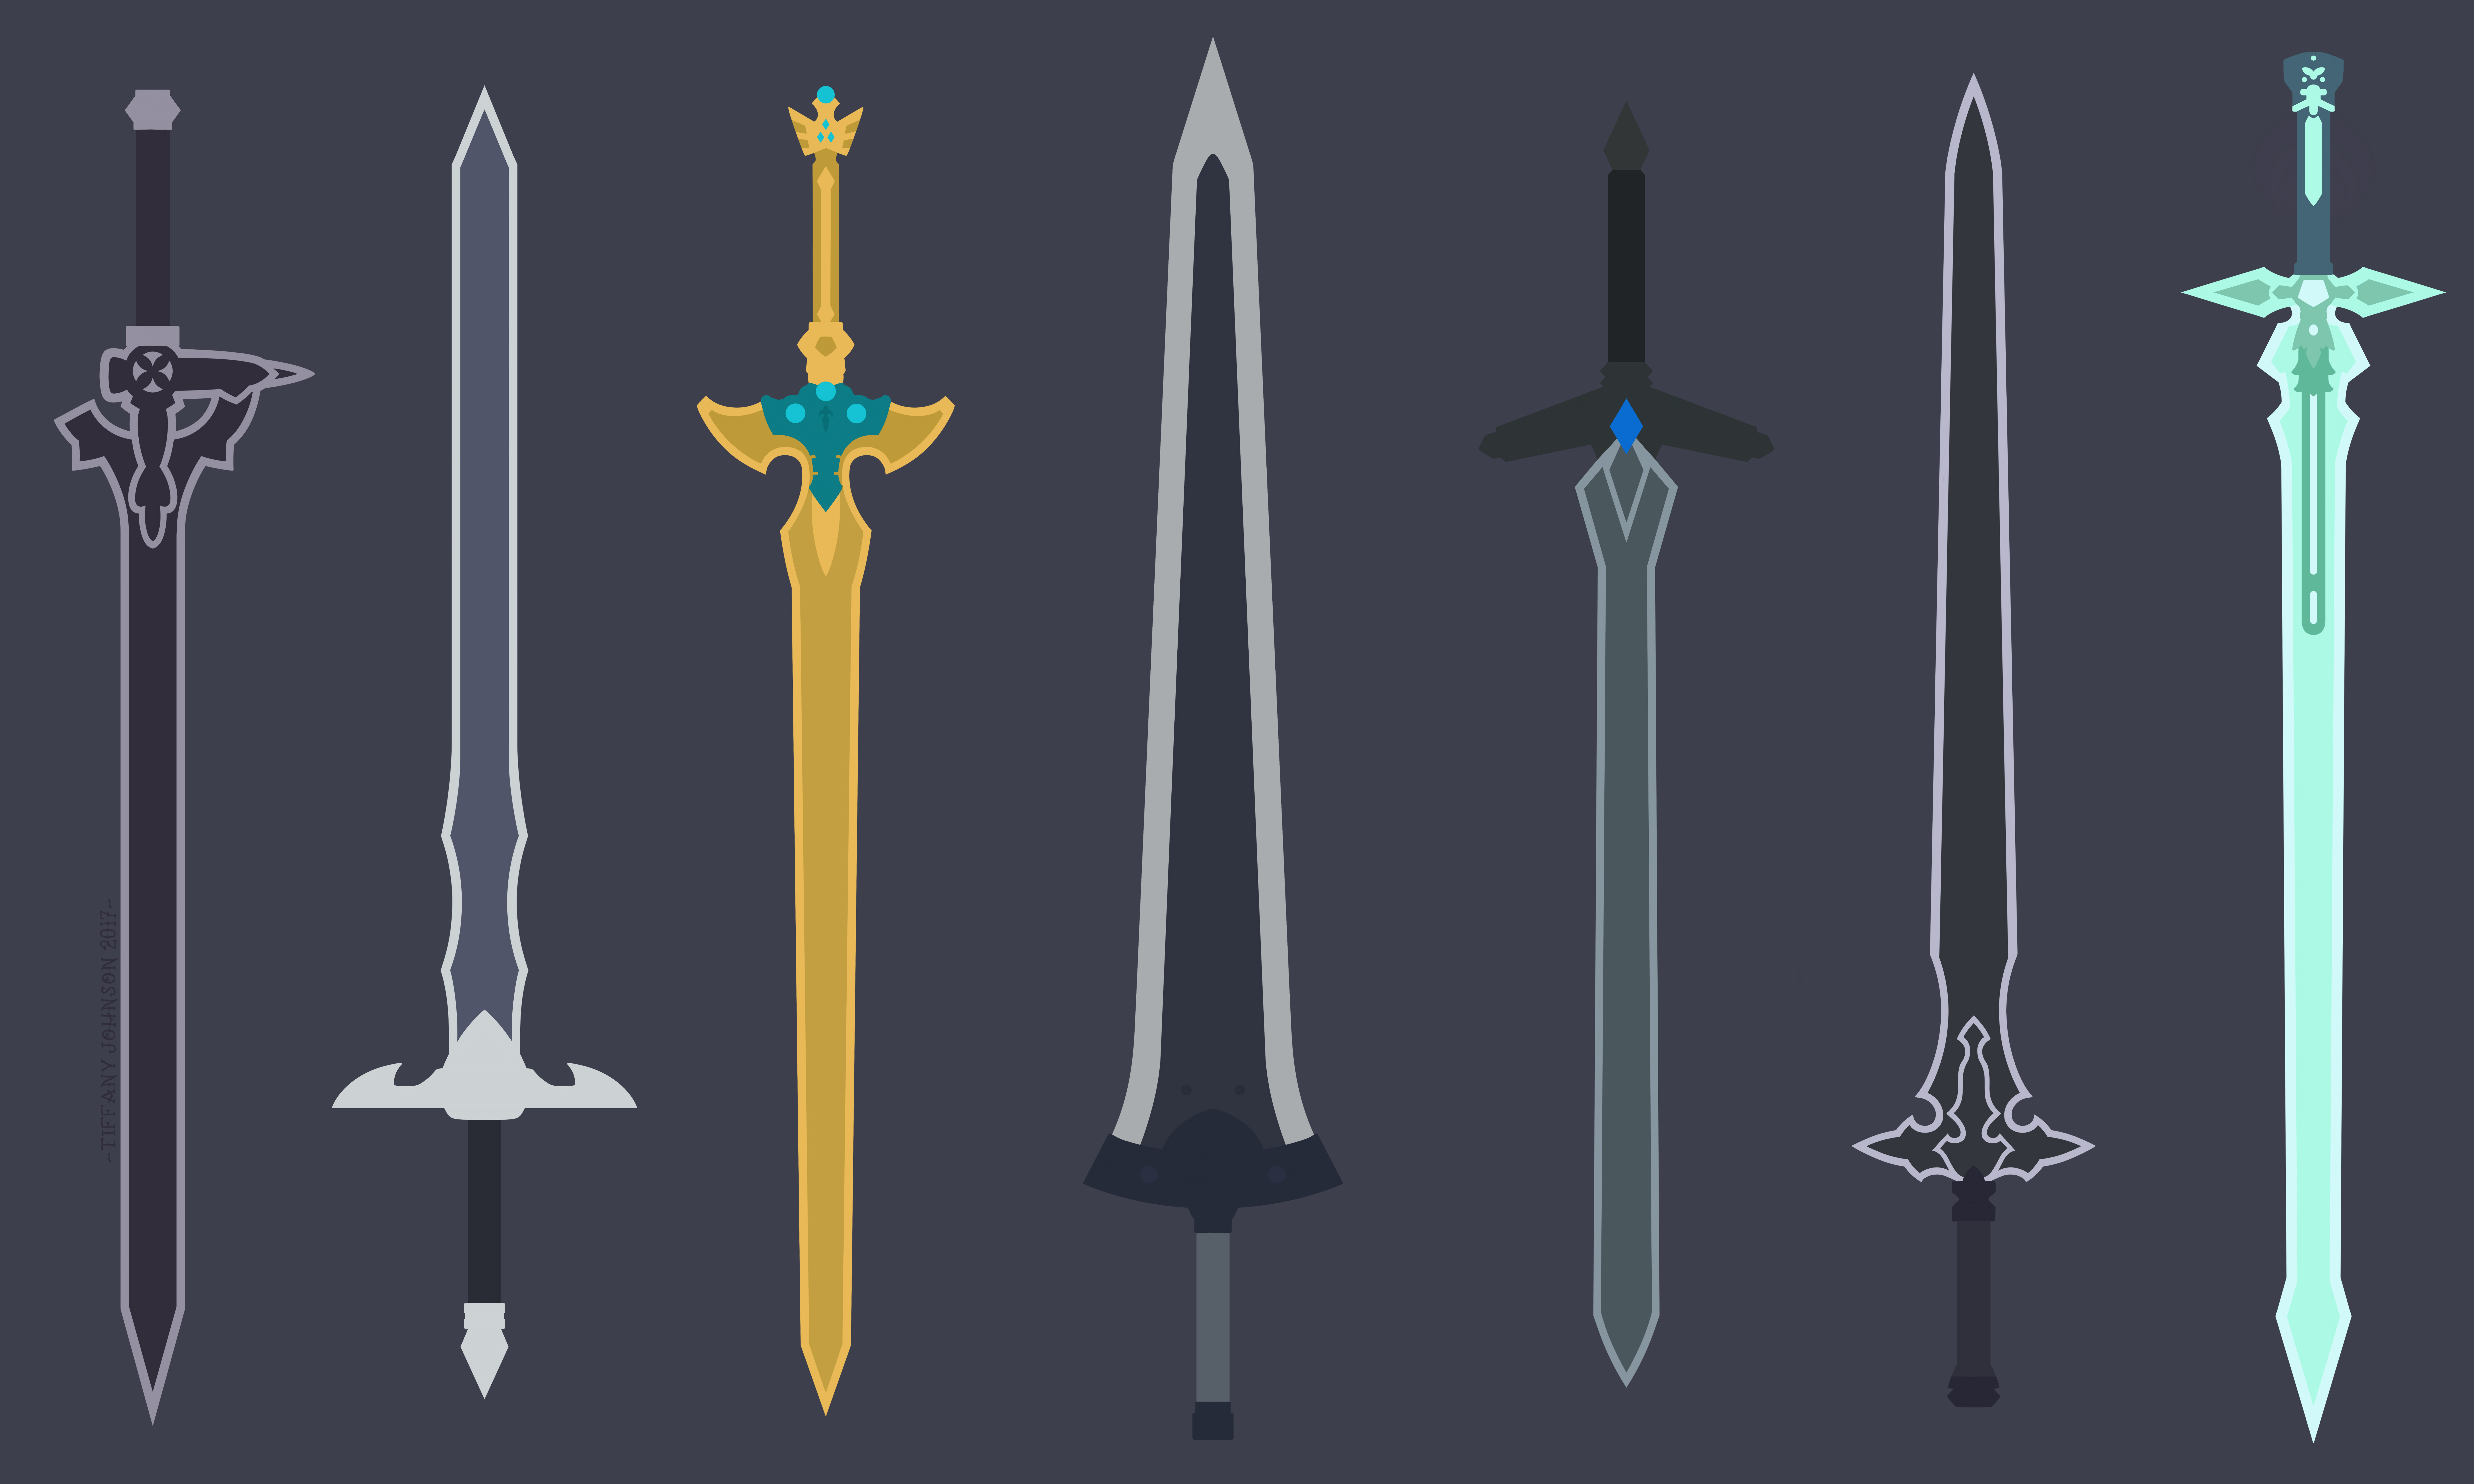 Kirito 39 s swords sword art online minimal by for Minimal art online